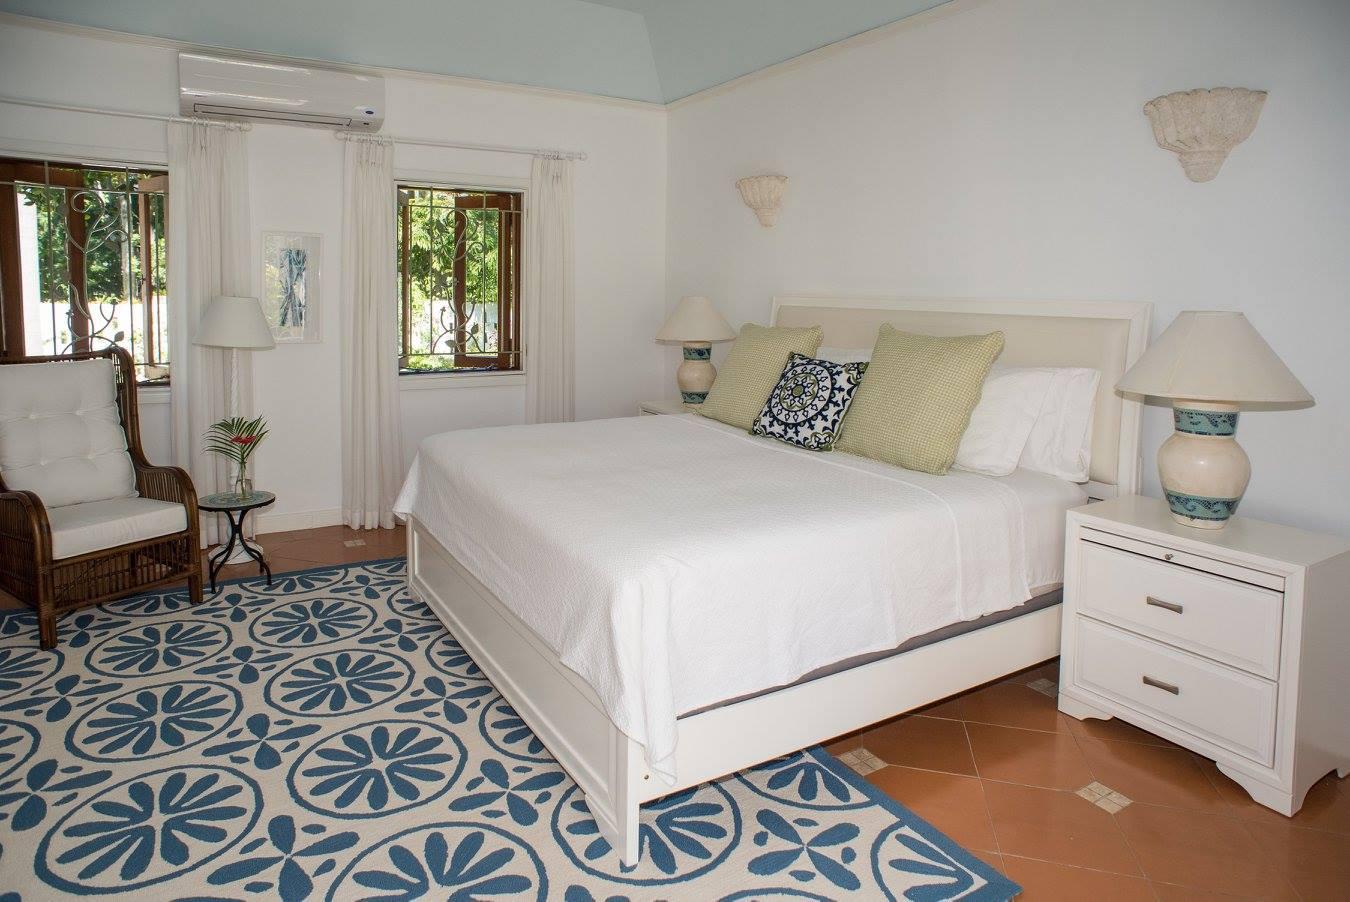 hibiscus bedroom inside a villa to rent in Barbados